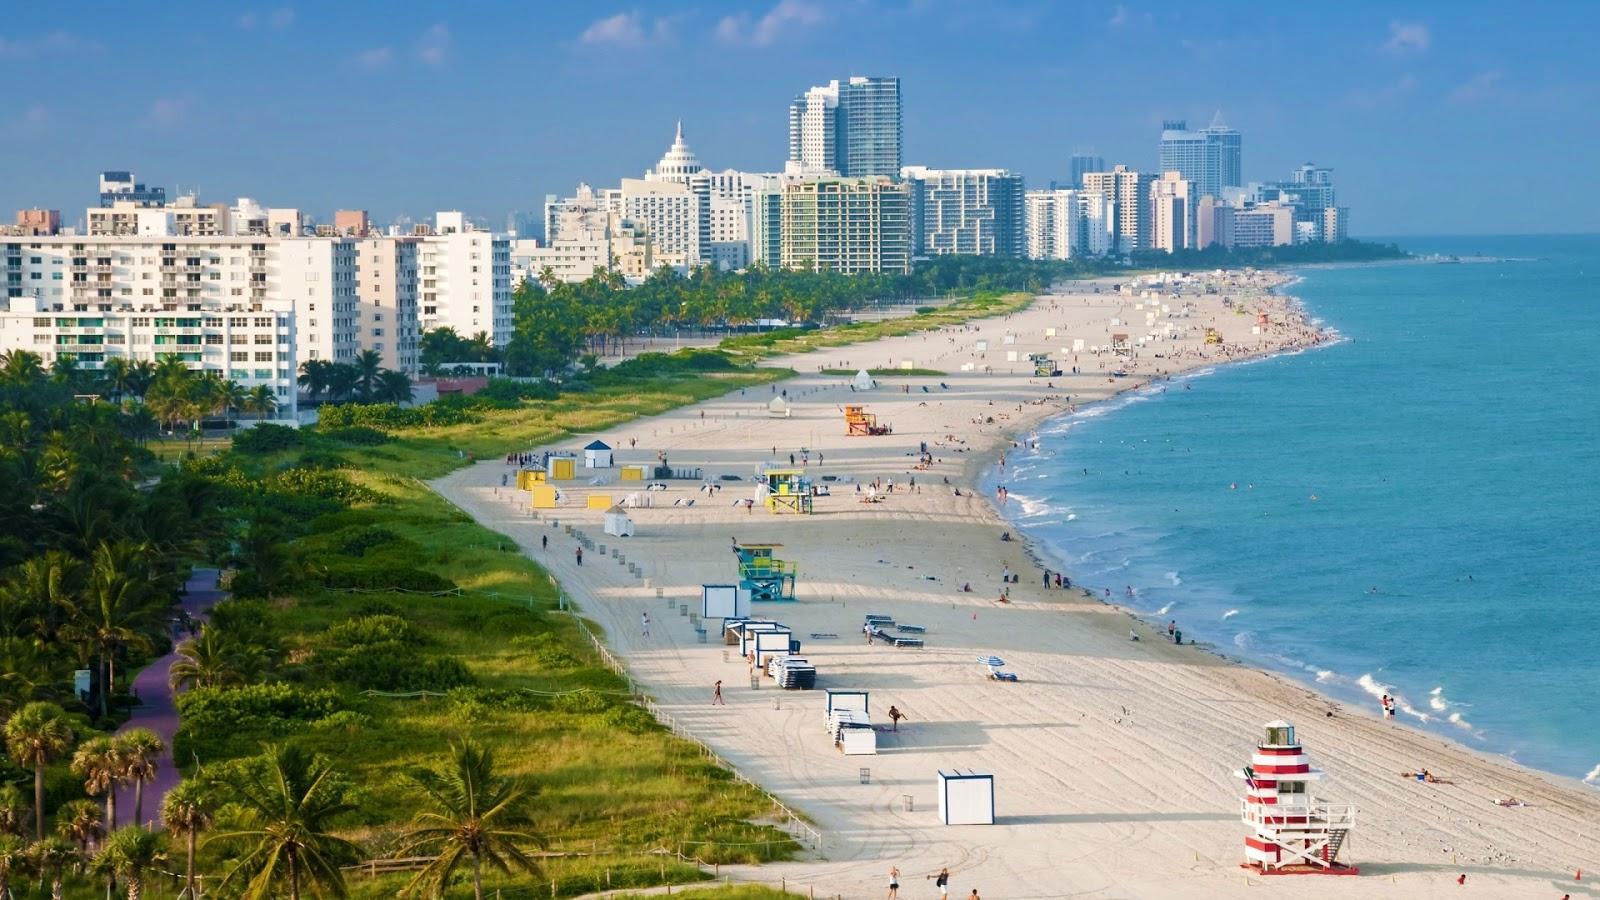 Miami Beach Full HD Desktop Wallpapers 1080p 1600x900